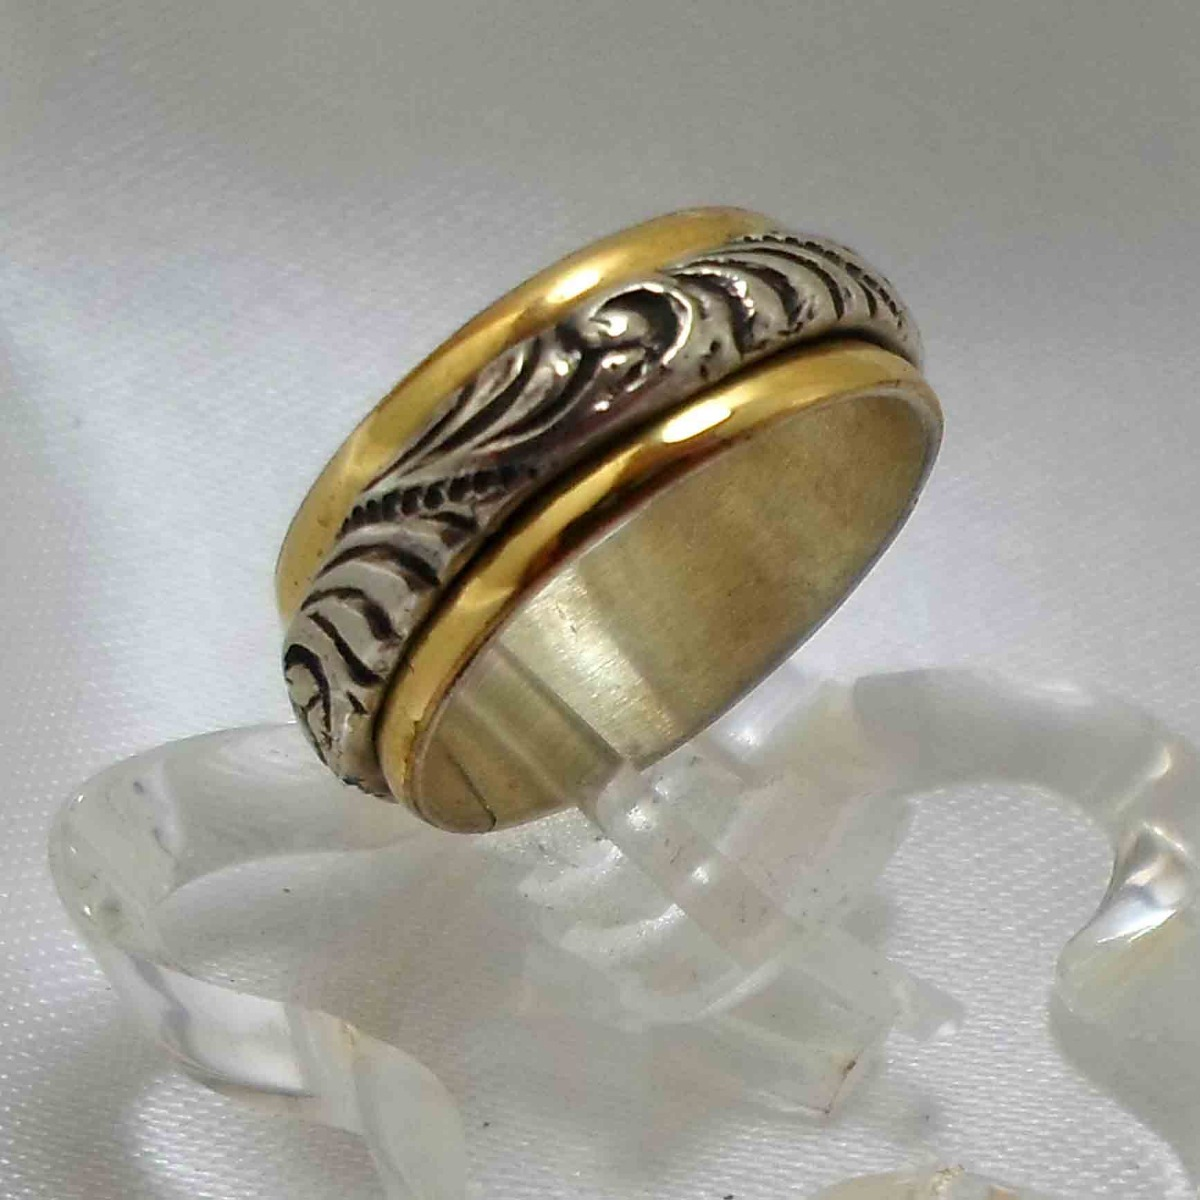 12ea98ff7139 anillo plata con oro modelo unisex alianza. nro 16. Cargando zoom.